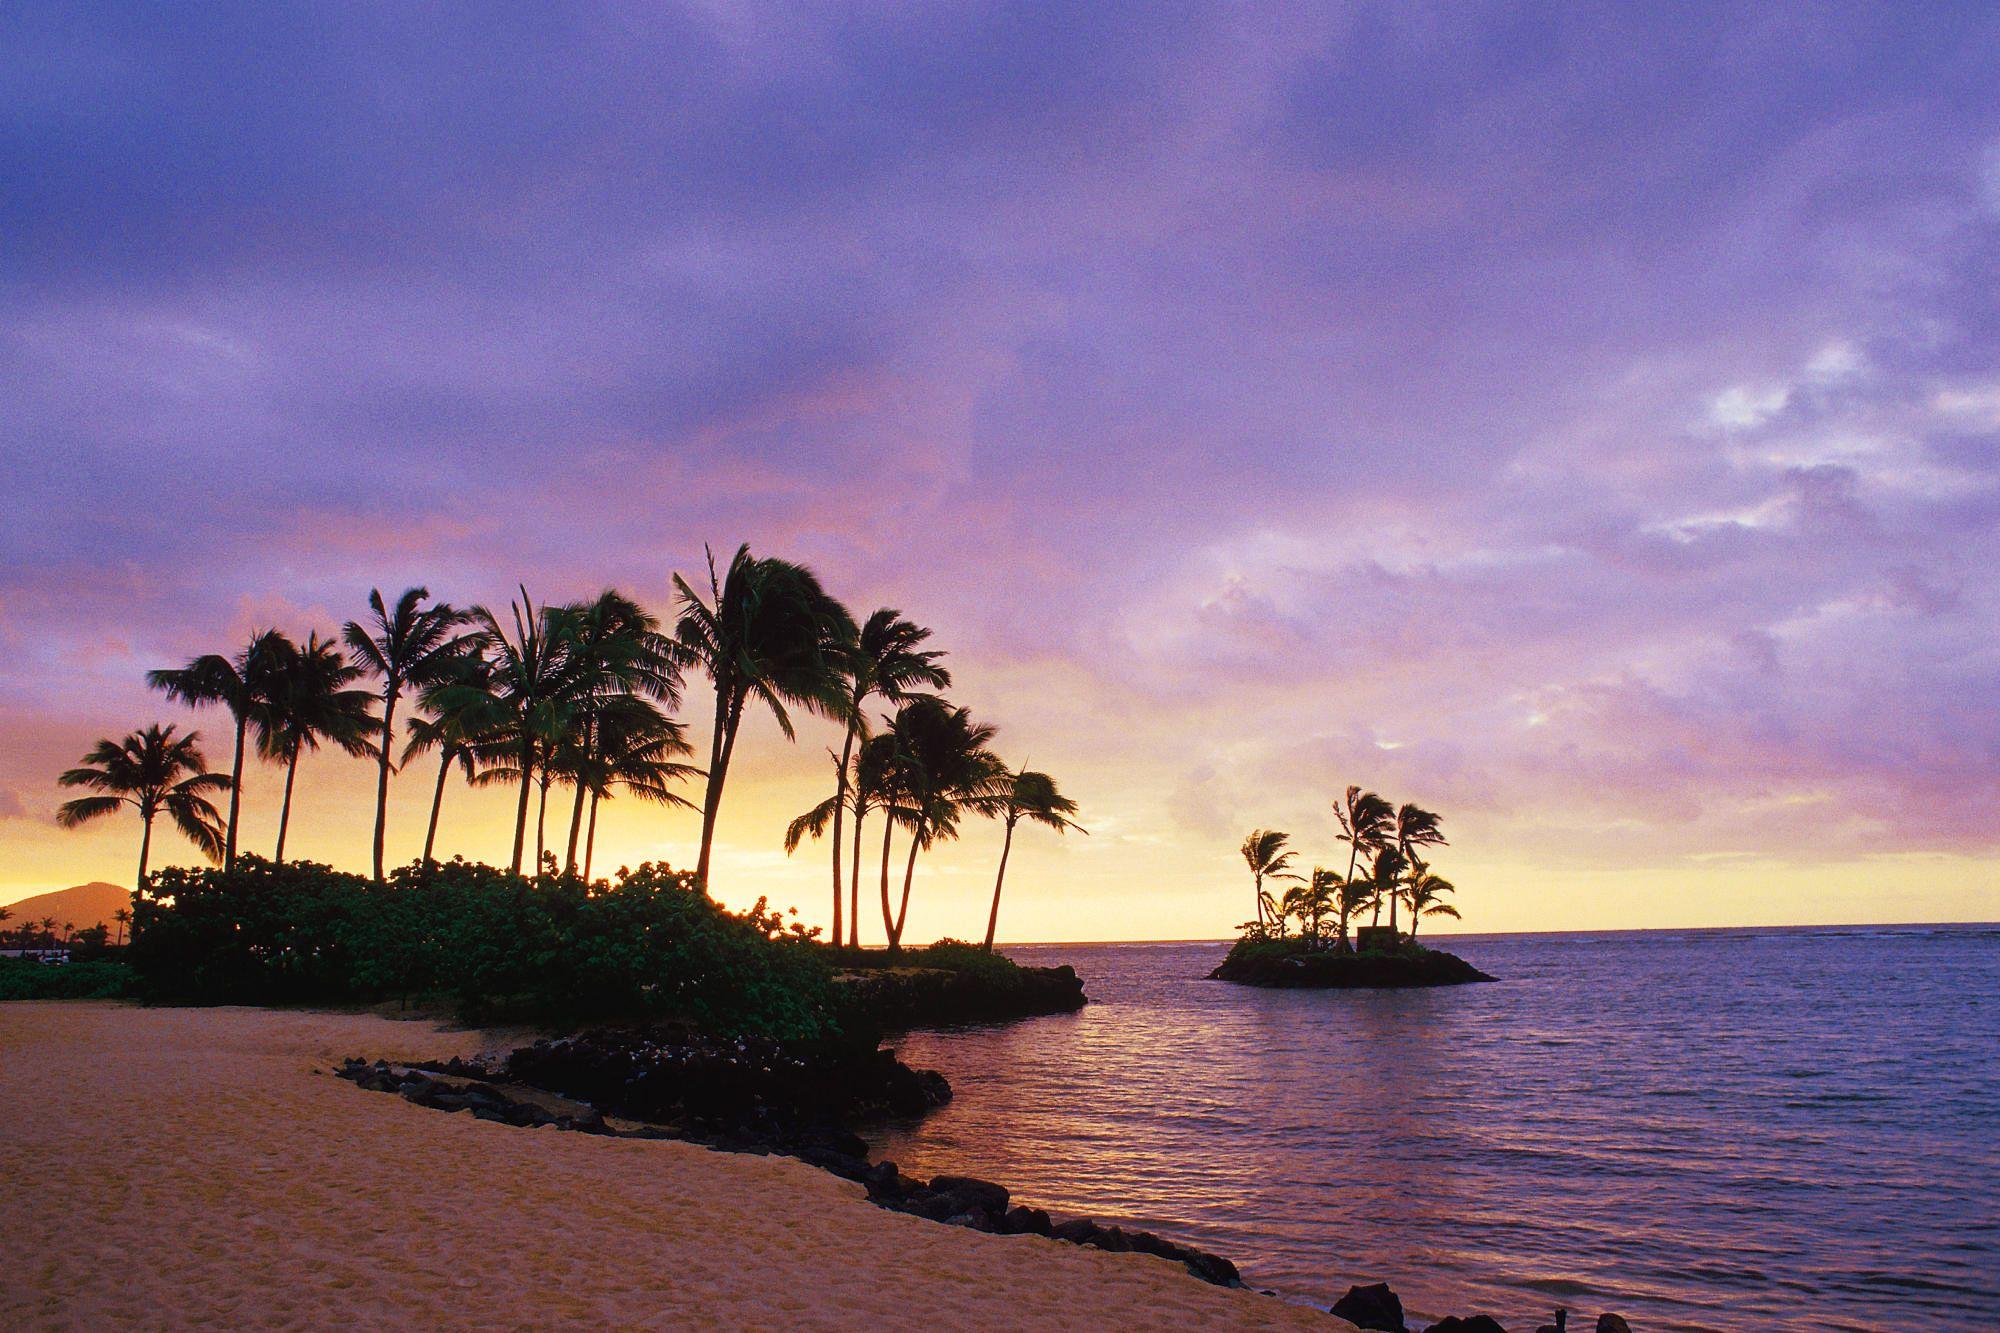 The Inspiring Wallpaper Of The Waialae Beach Honolulu Hawaii Beach Wallpapers Sky Palms Hawaii Oahu Hawaii Beaches Sunset Beach Hawaii Oahu Beaches